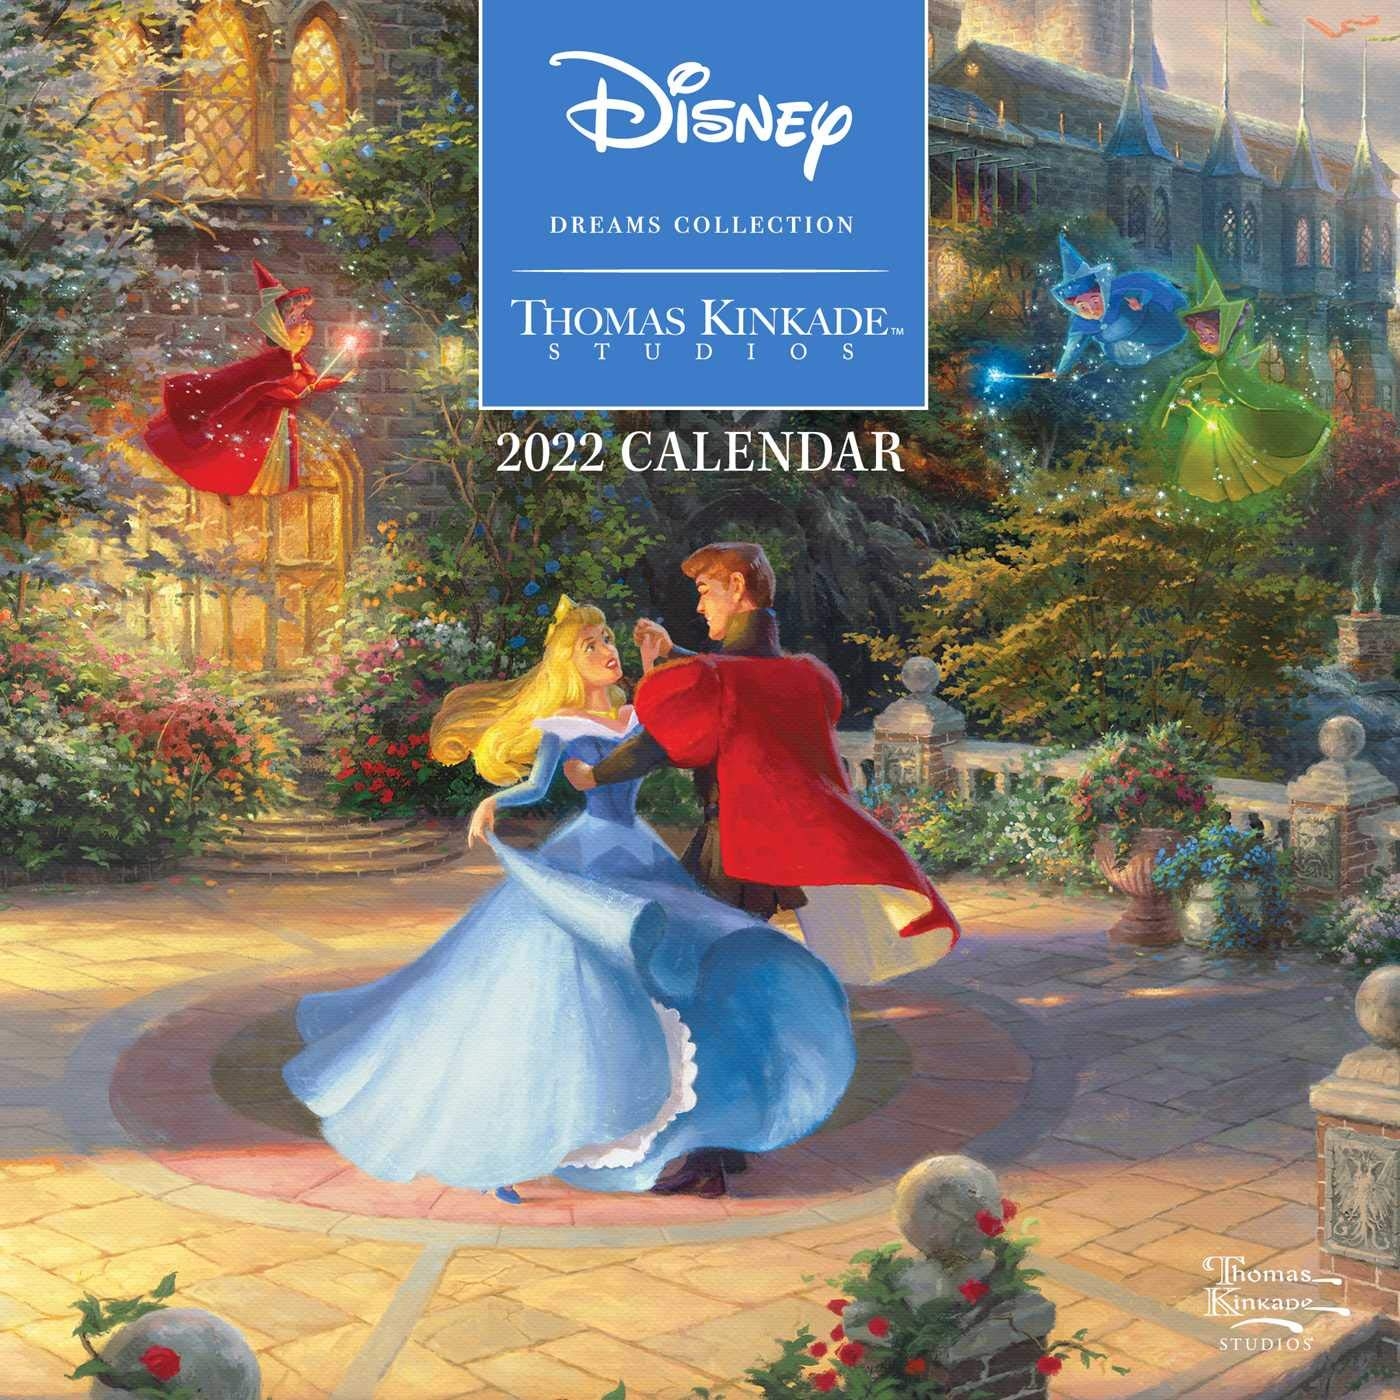 Image for Disney Dreams Collection by Thomas Kinkade Studios: 2022 Mini Wall Calendar